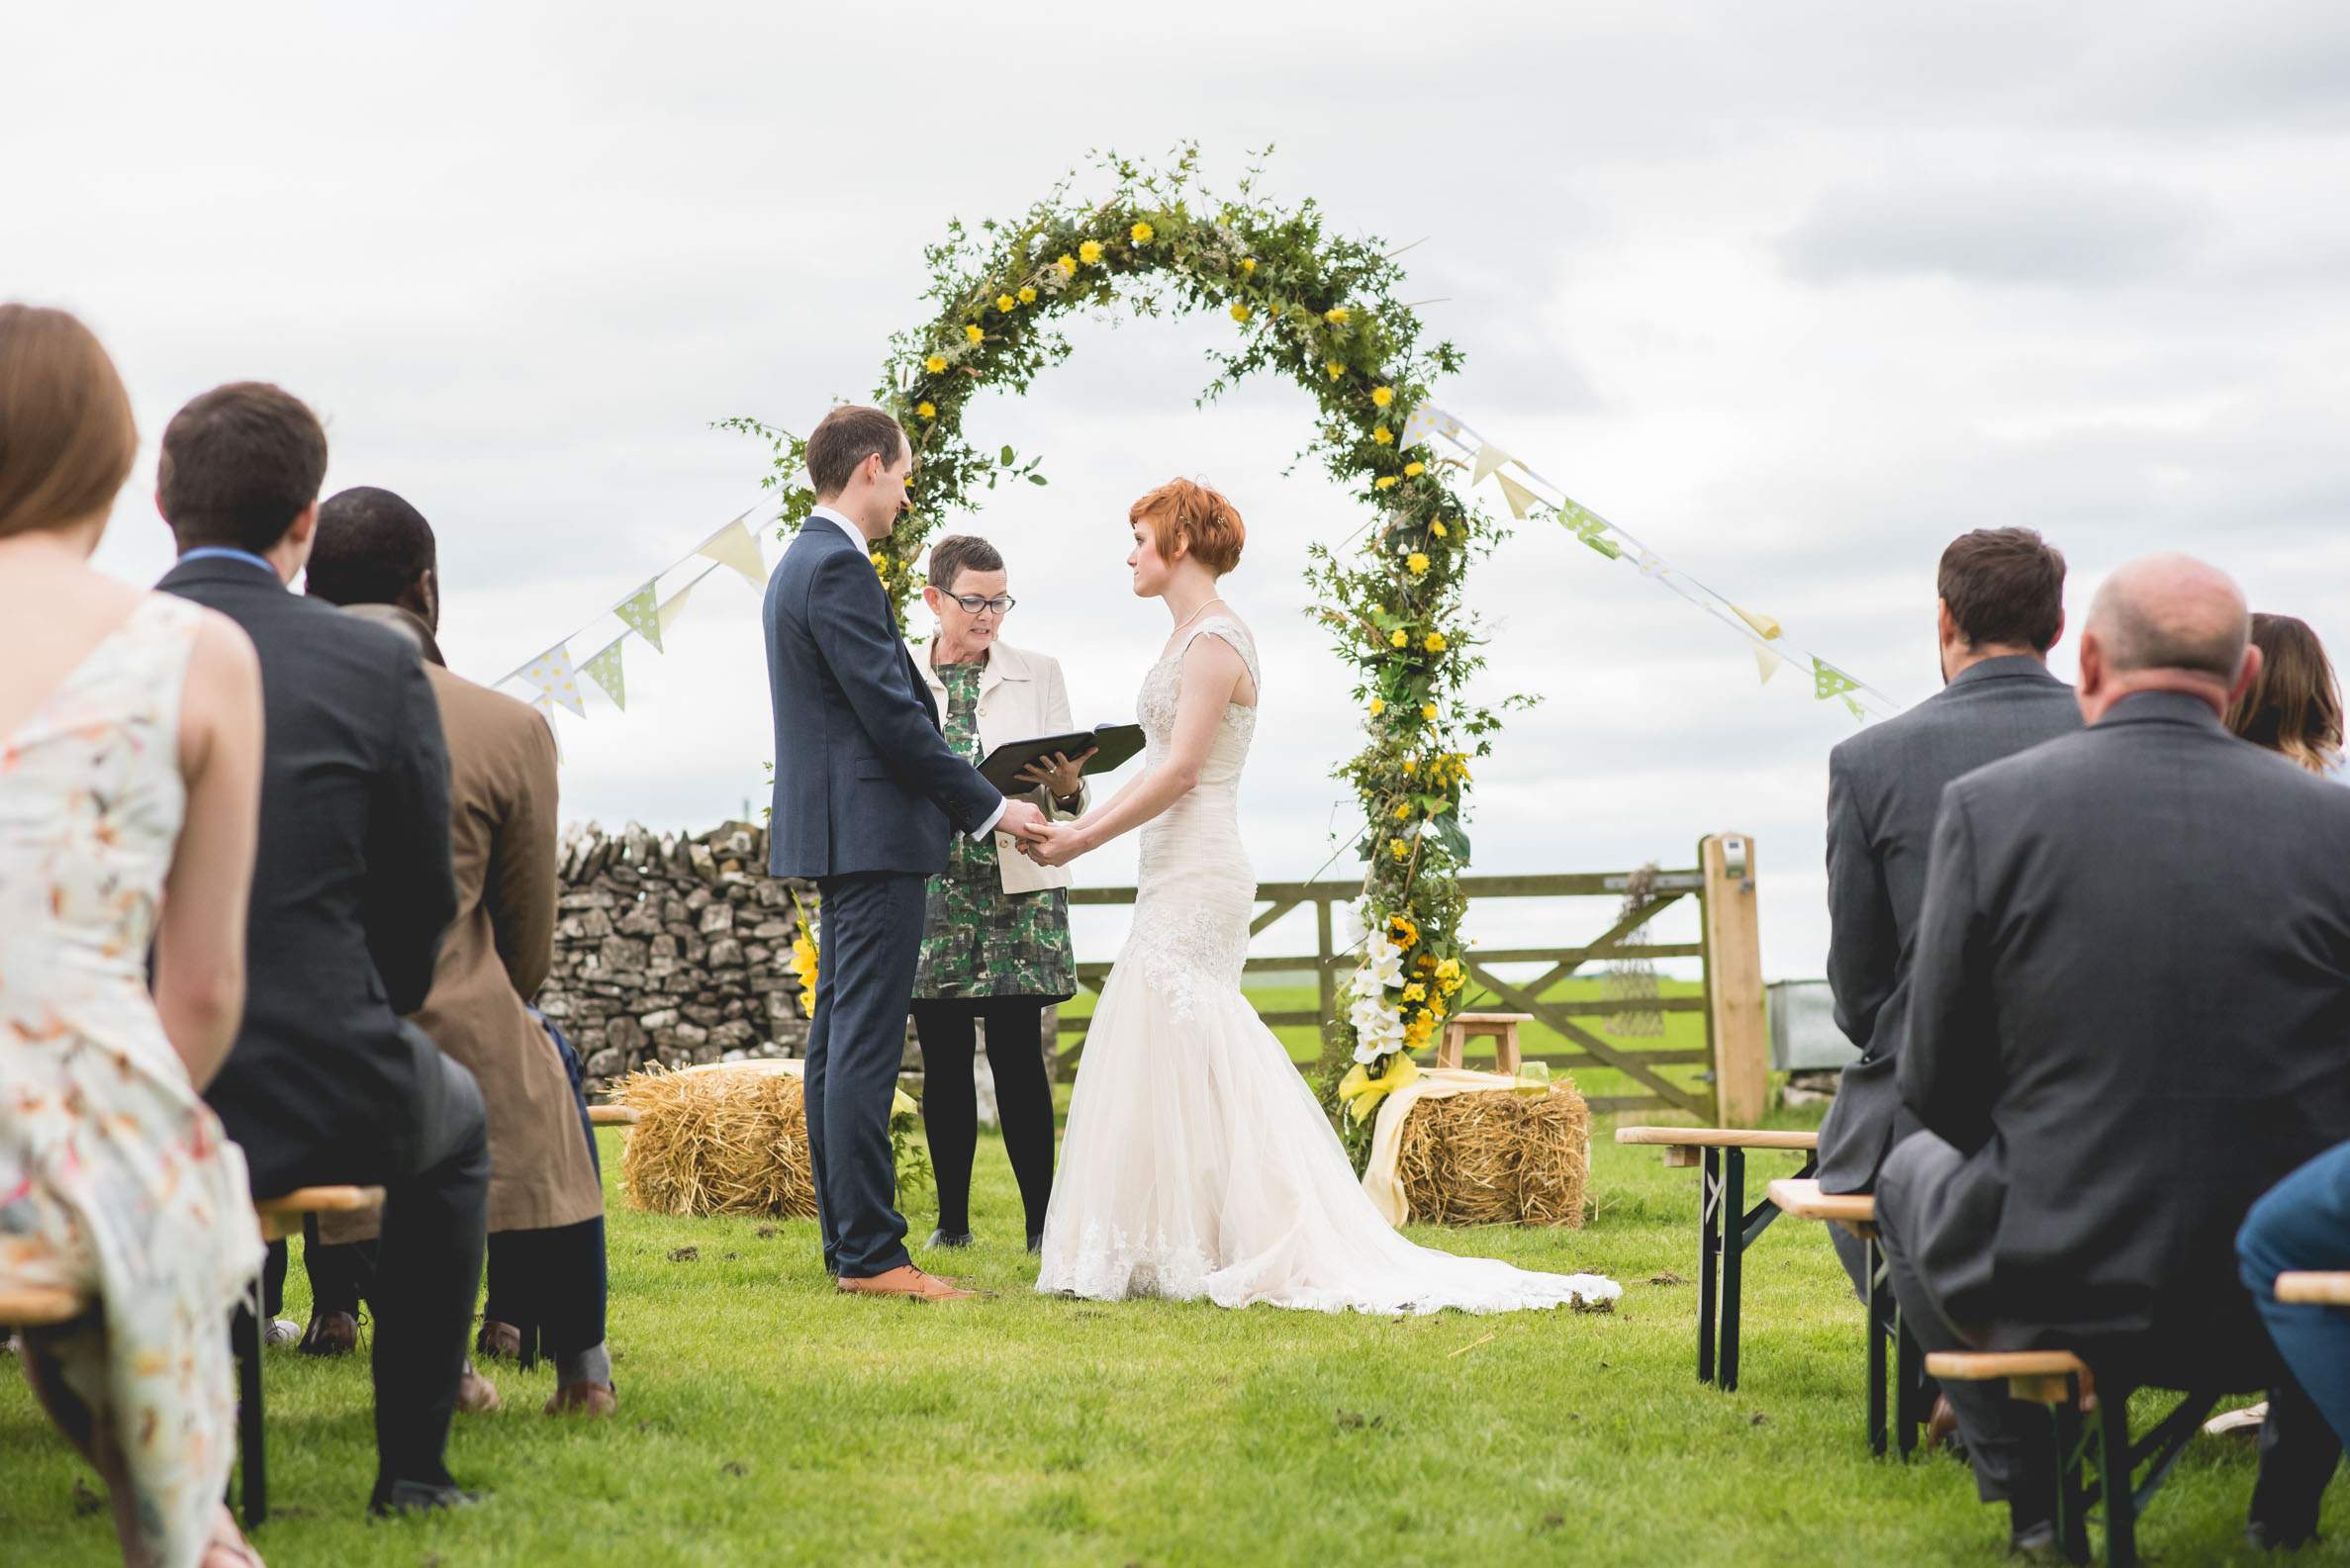 Peak+district+farm+wedding+lower+damgate+photographer-124.jpg